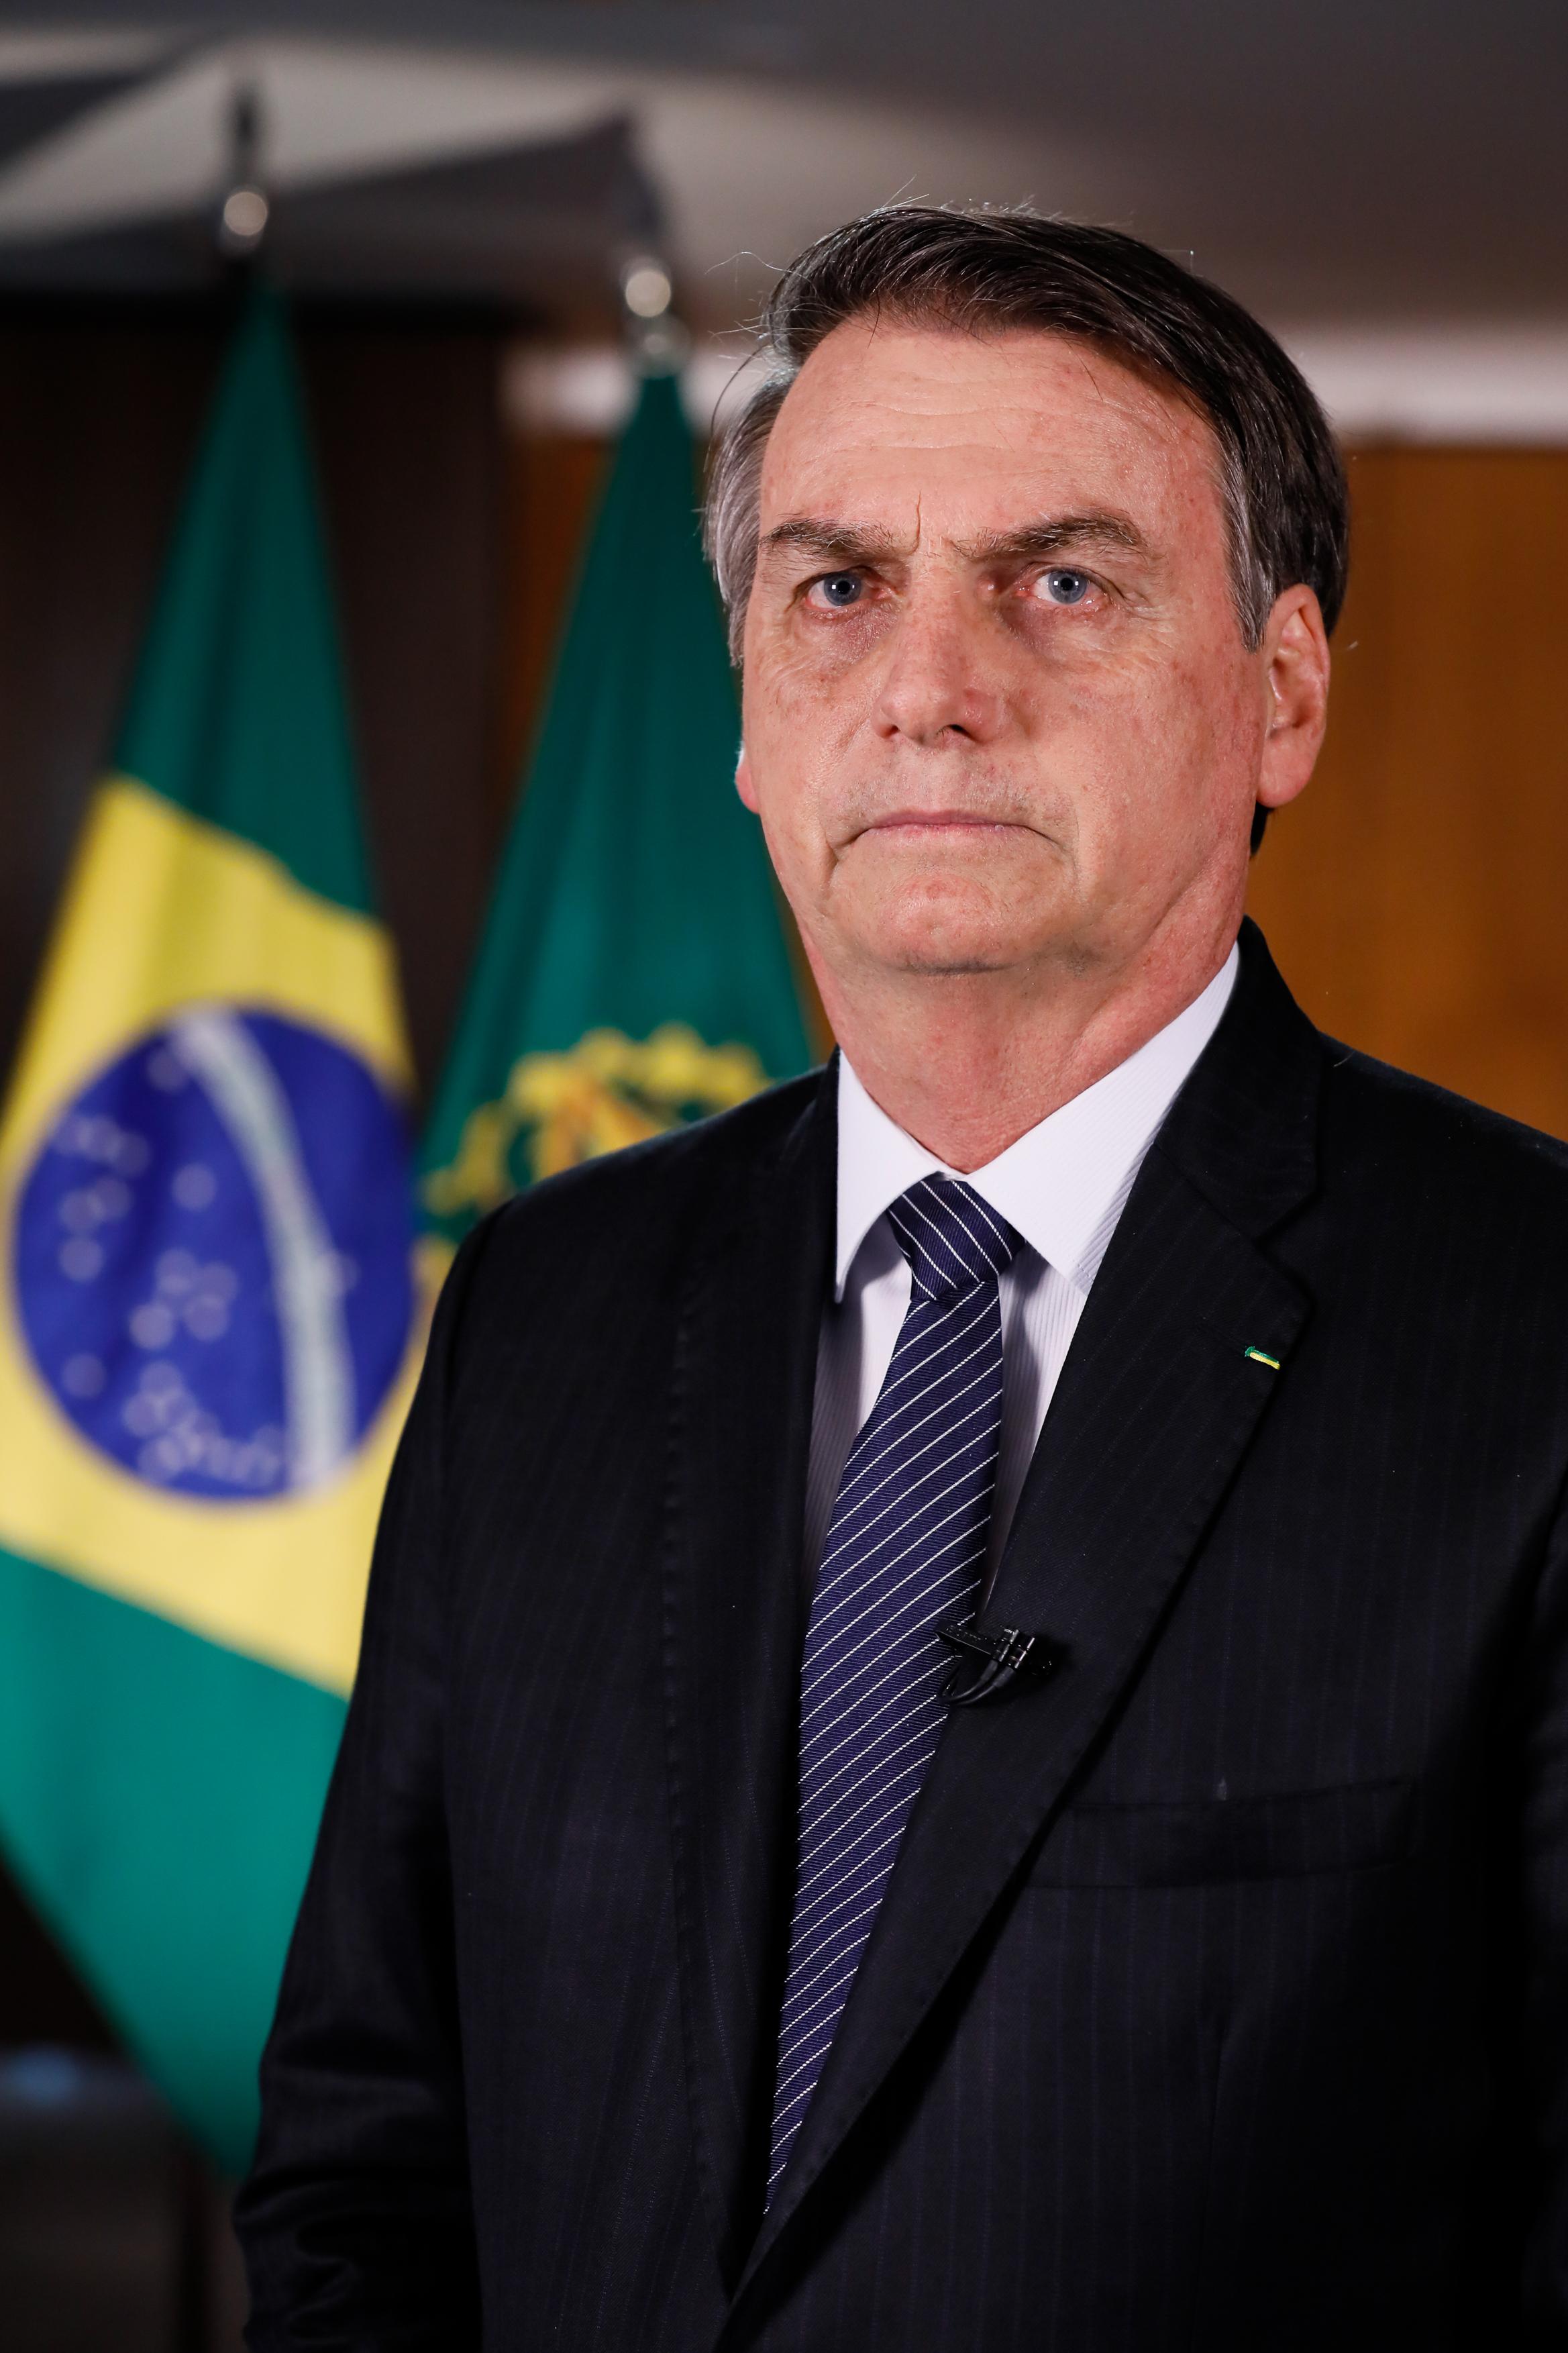 Jair Bolsonaro - Simple English Wikipedia, the free encyclopedia